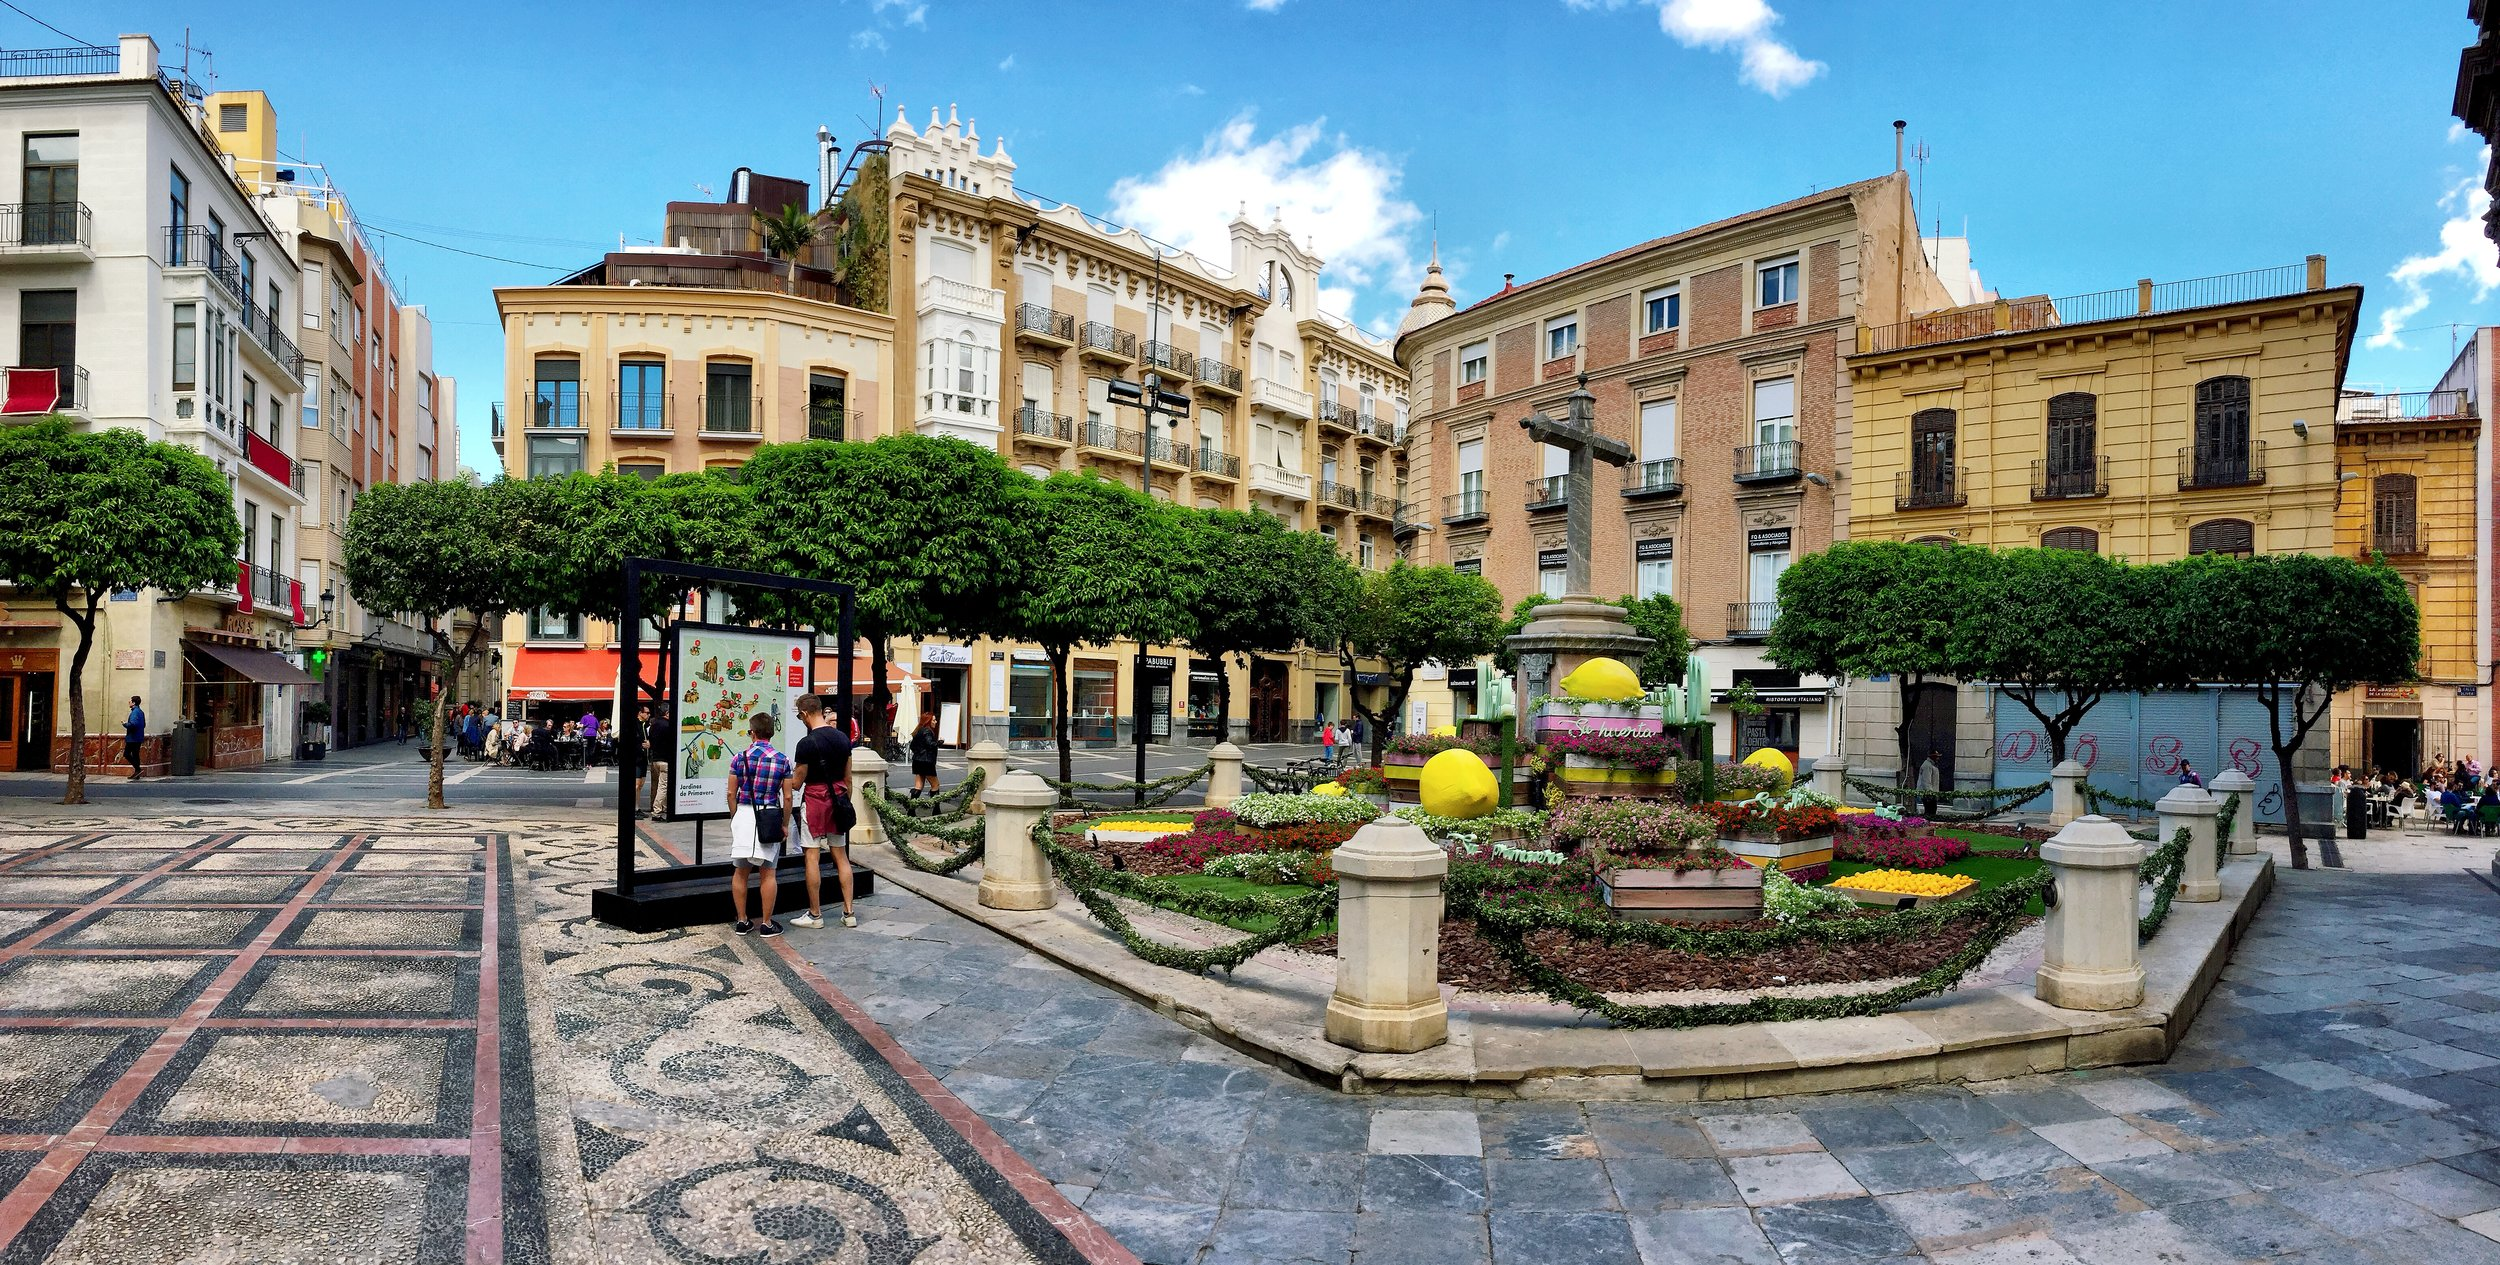 Jardines de Primavera Murcia 2018 (3).JPG